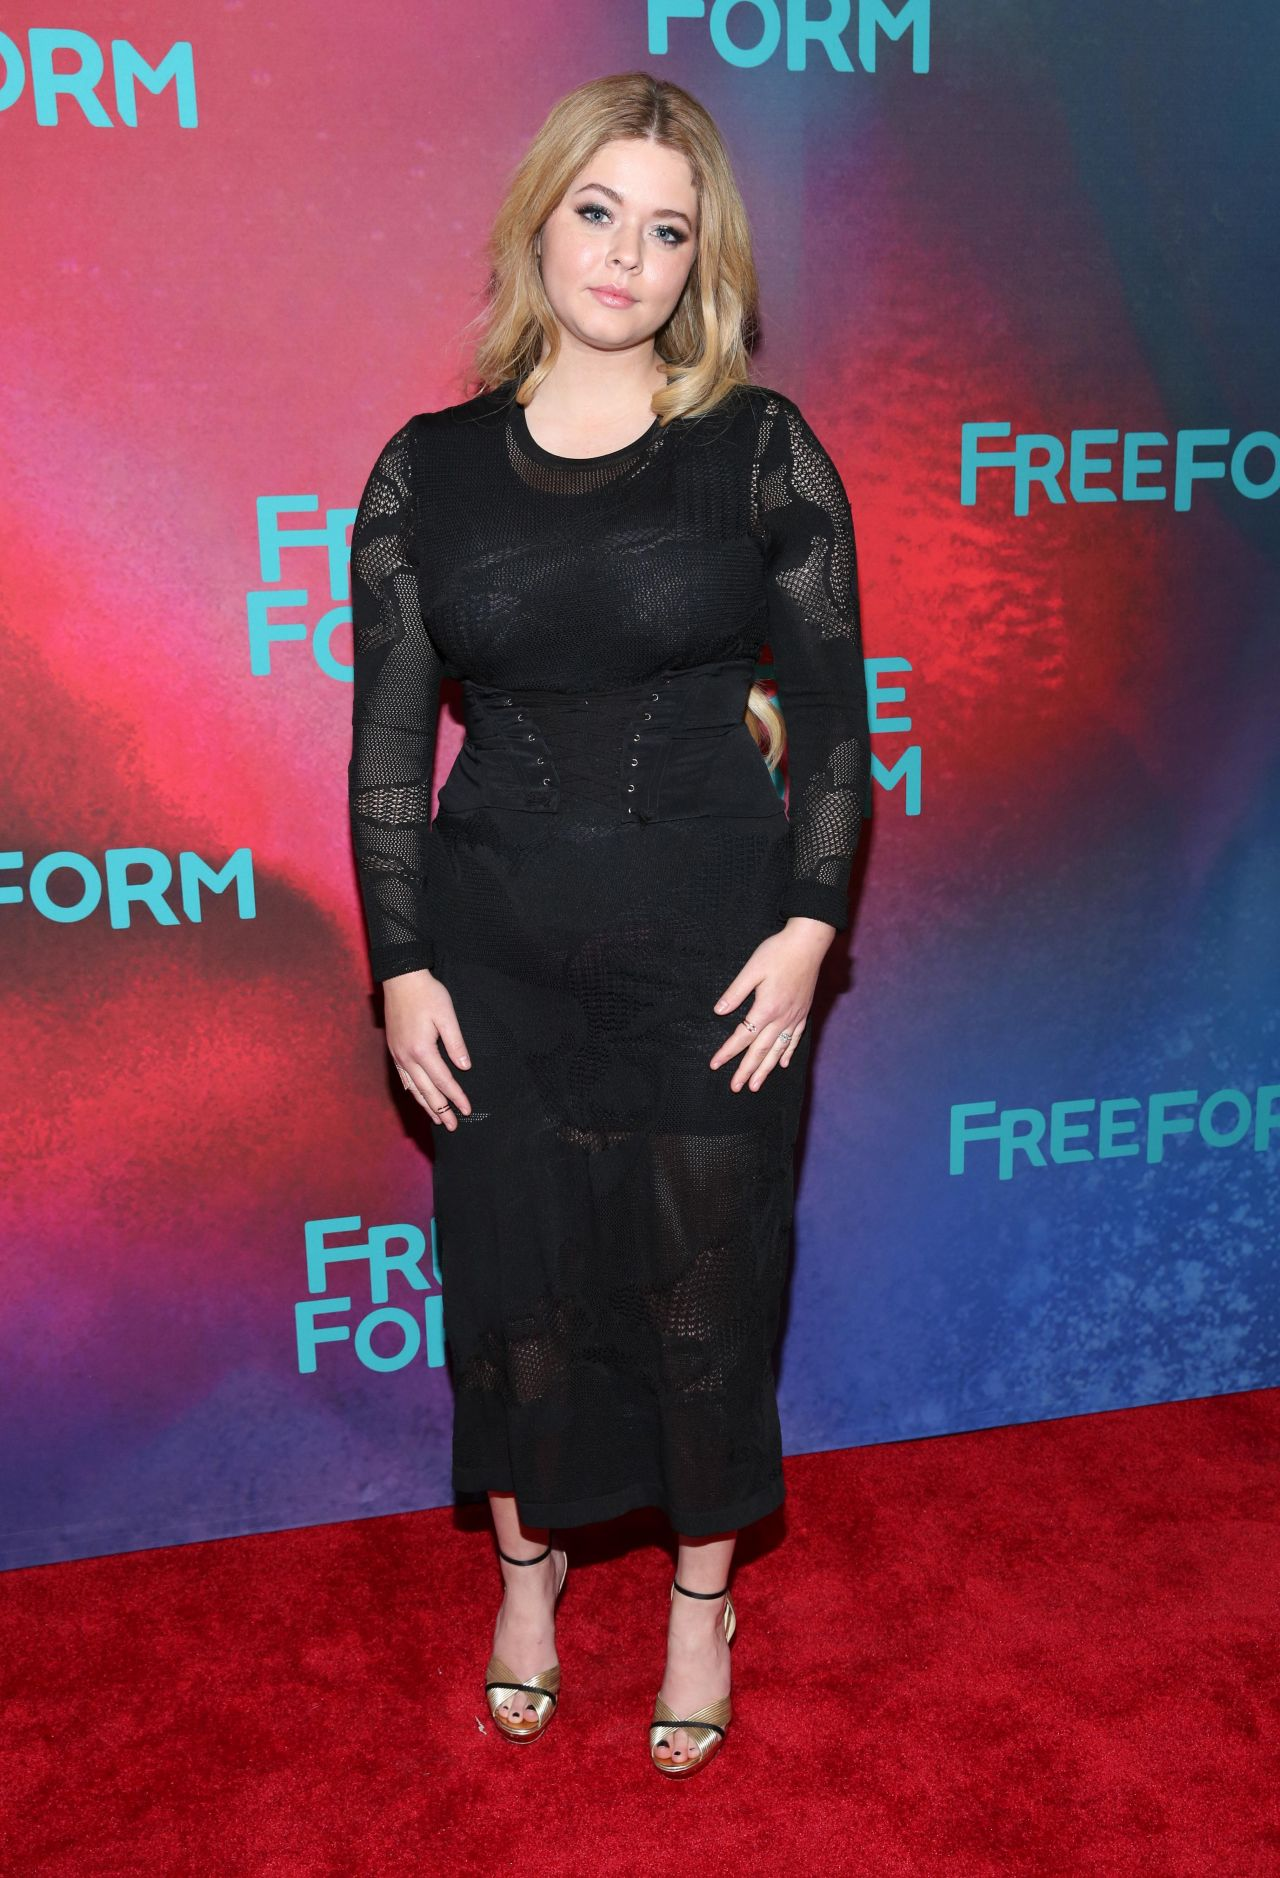 Sasha Pieterse At Freeform Upfront In New York 4192017